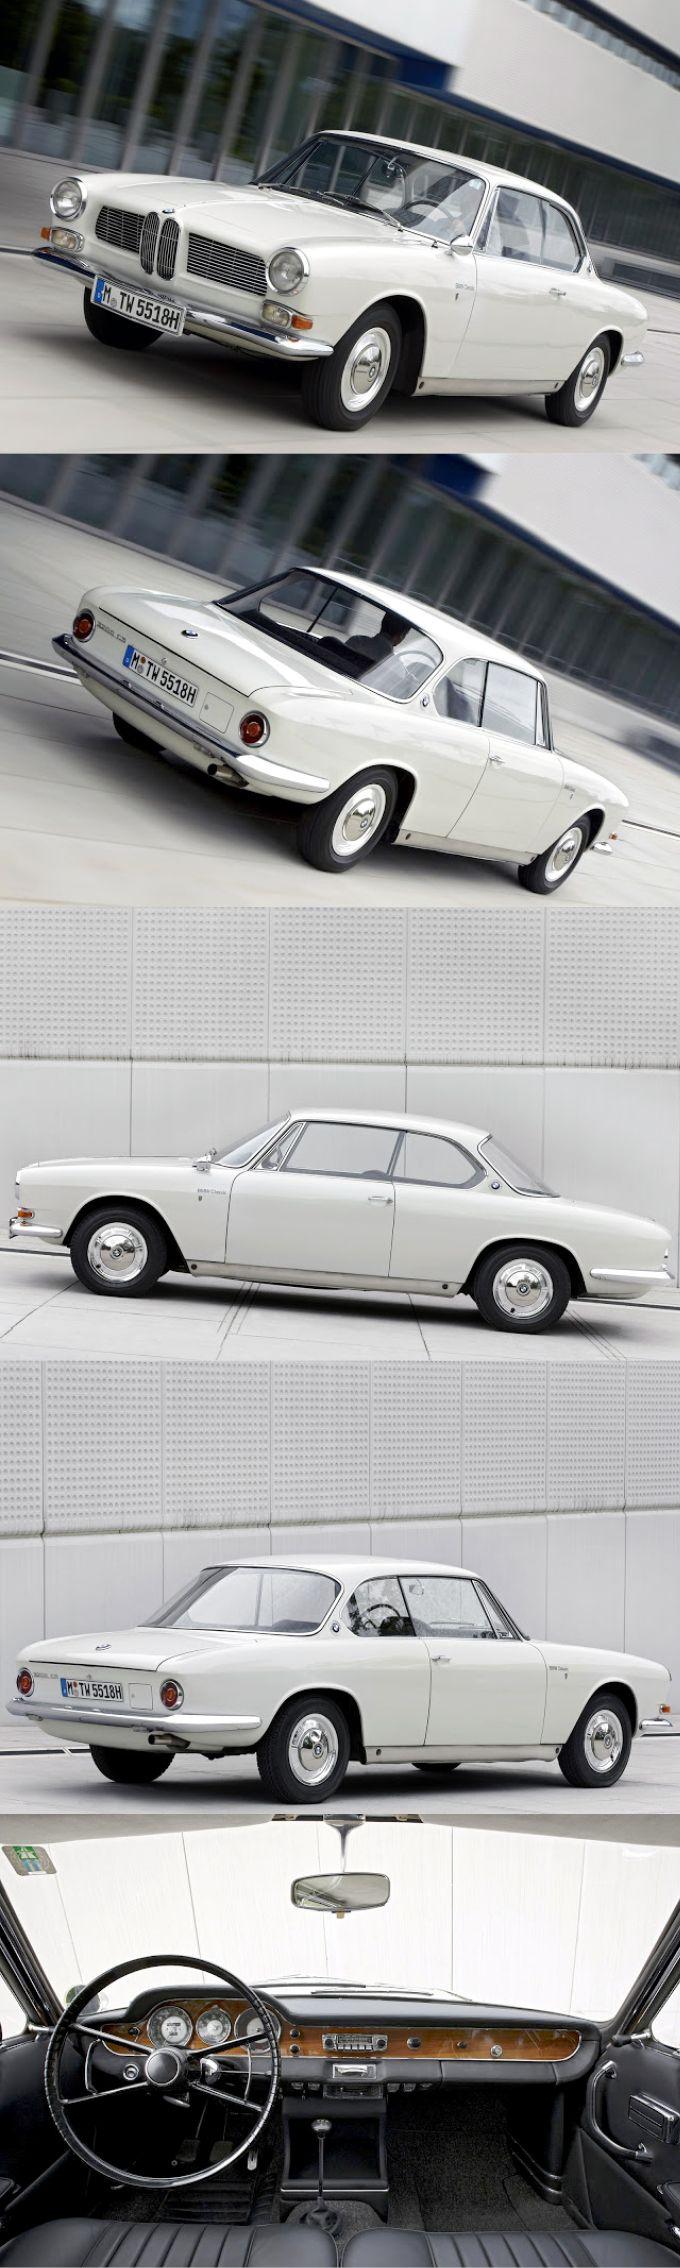 1962 BMW 3200 CS / Bertone / 603pcs / 160hp V8 / Germany / white ...